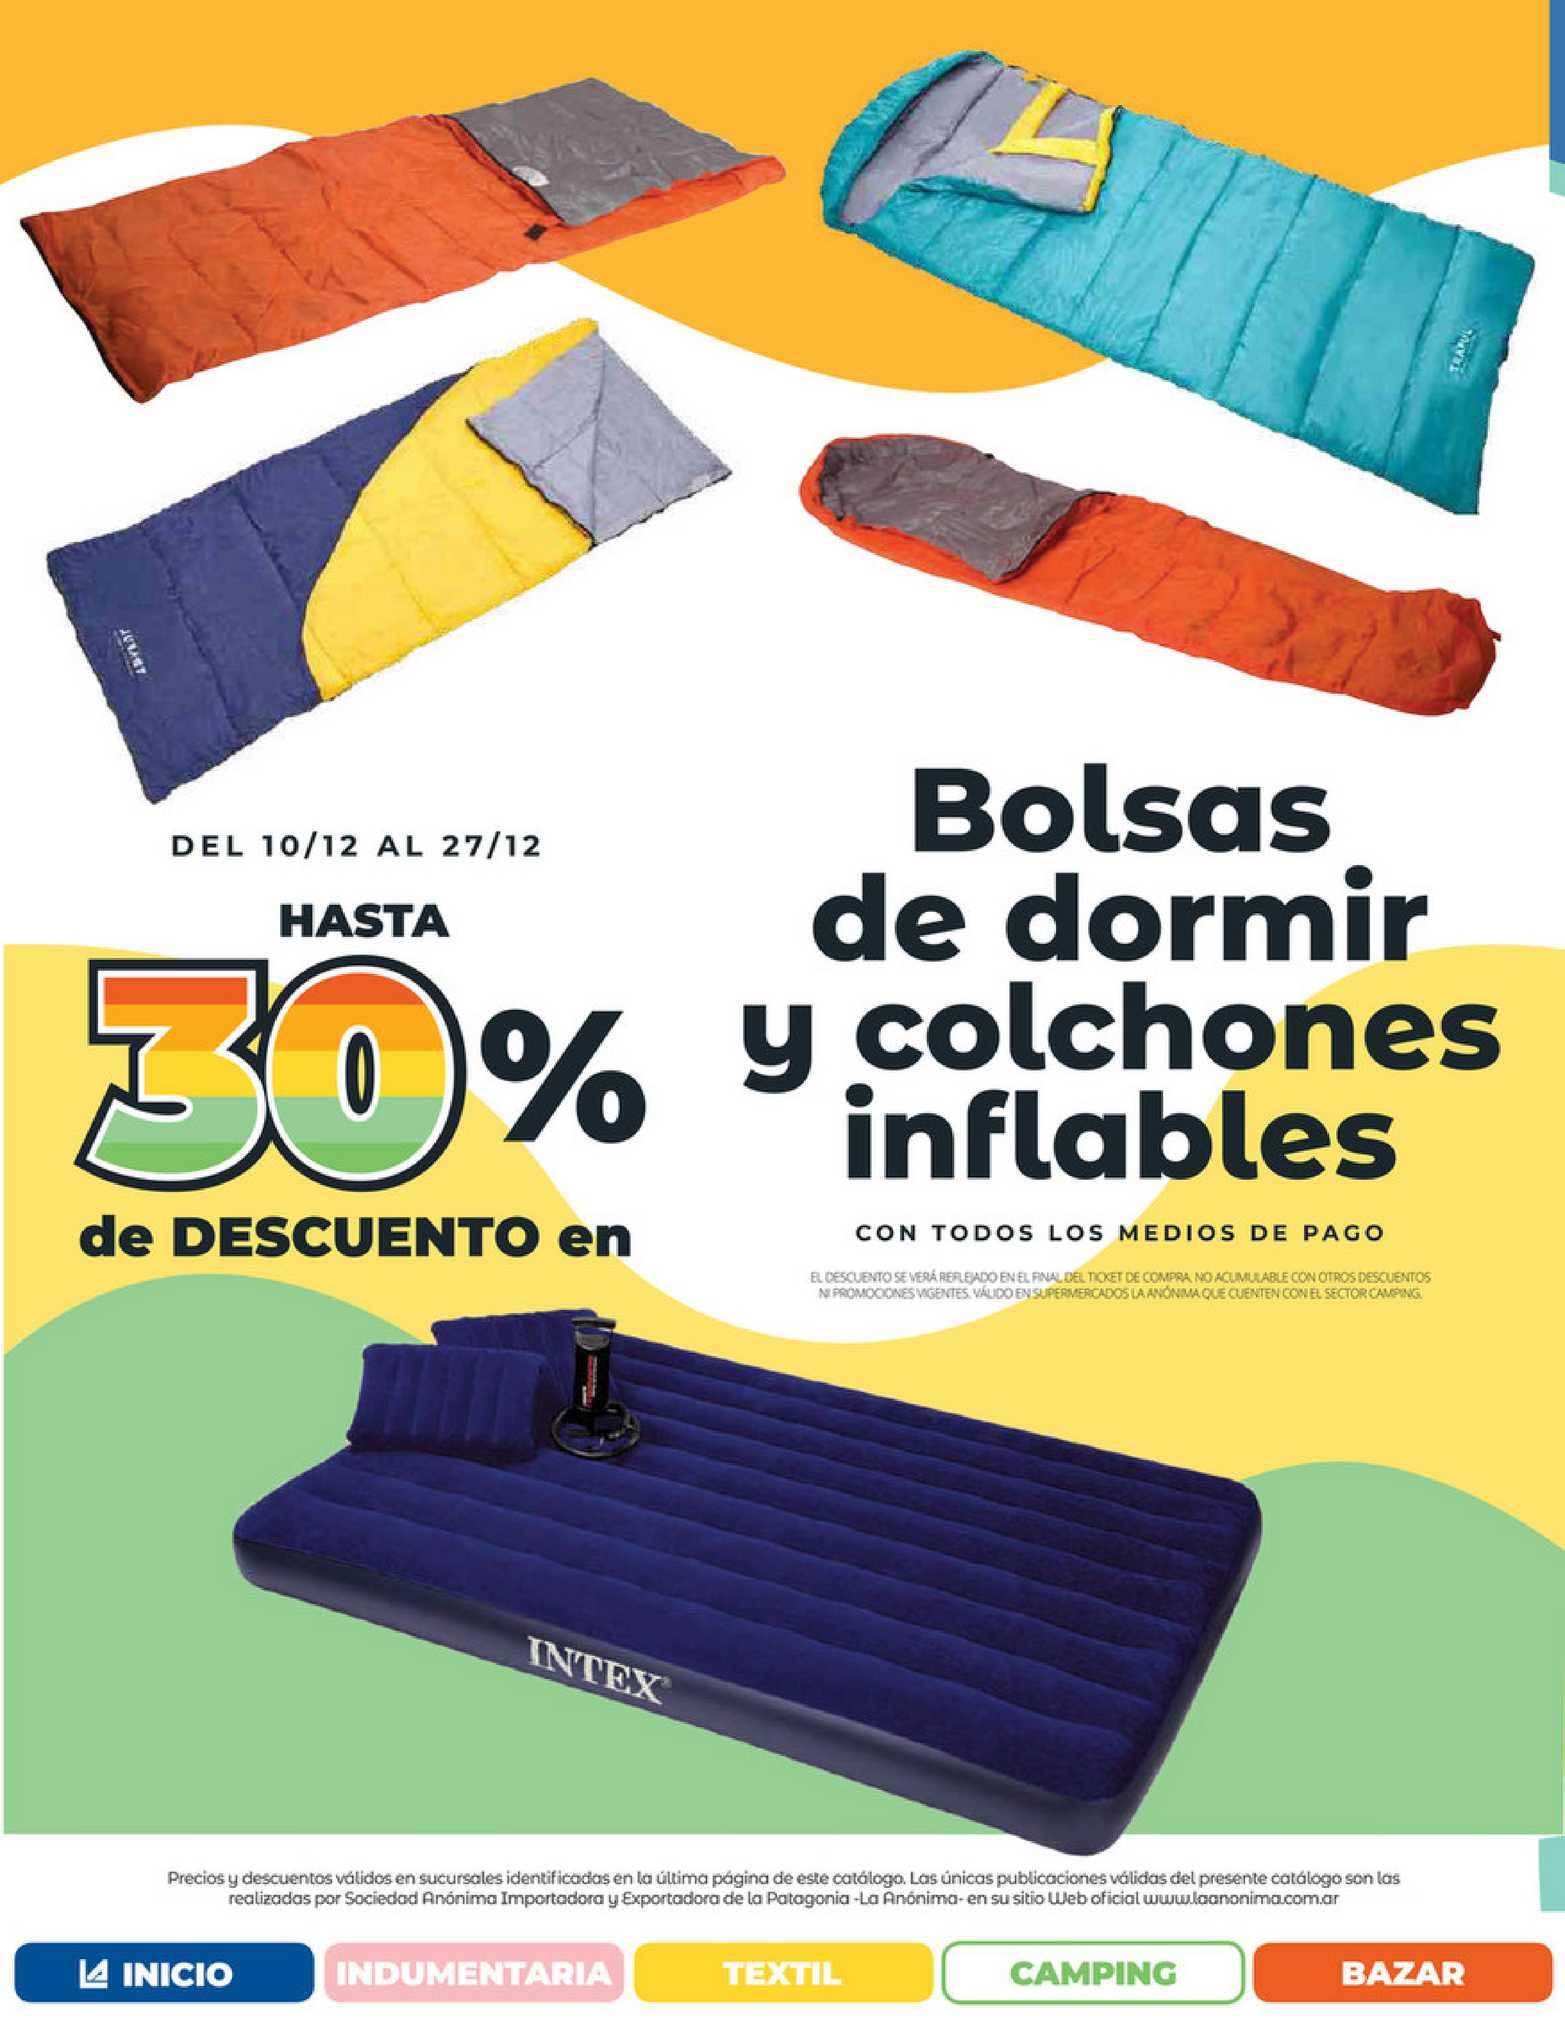 La Anónima Bolsas De Dormir Y Colchones Inflables